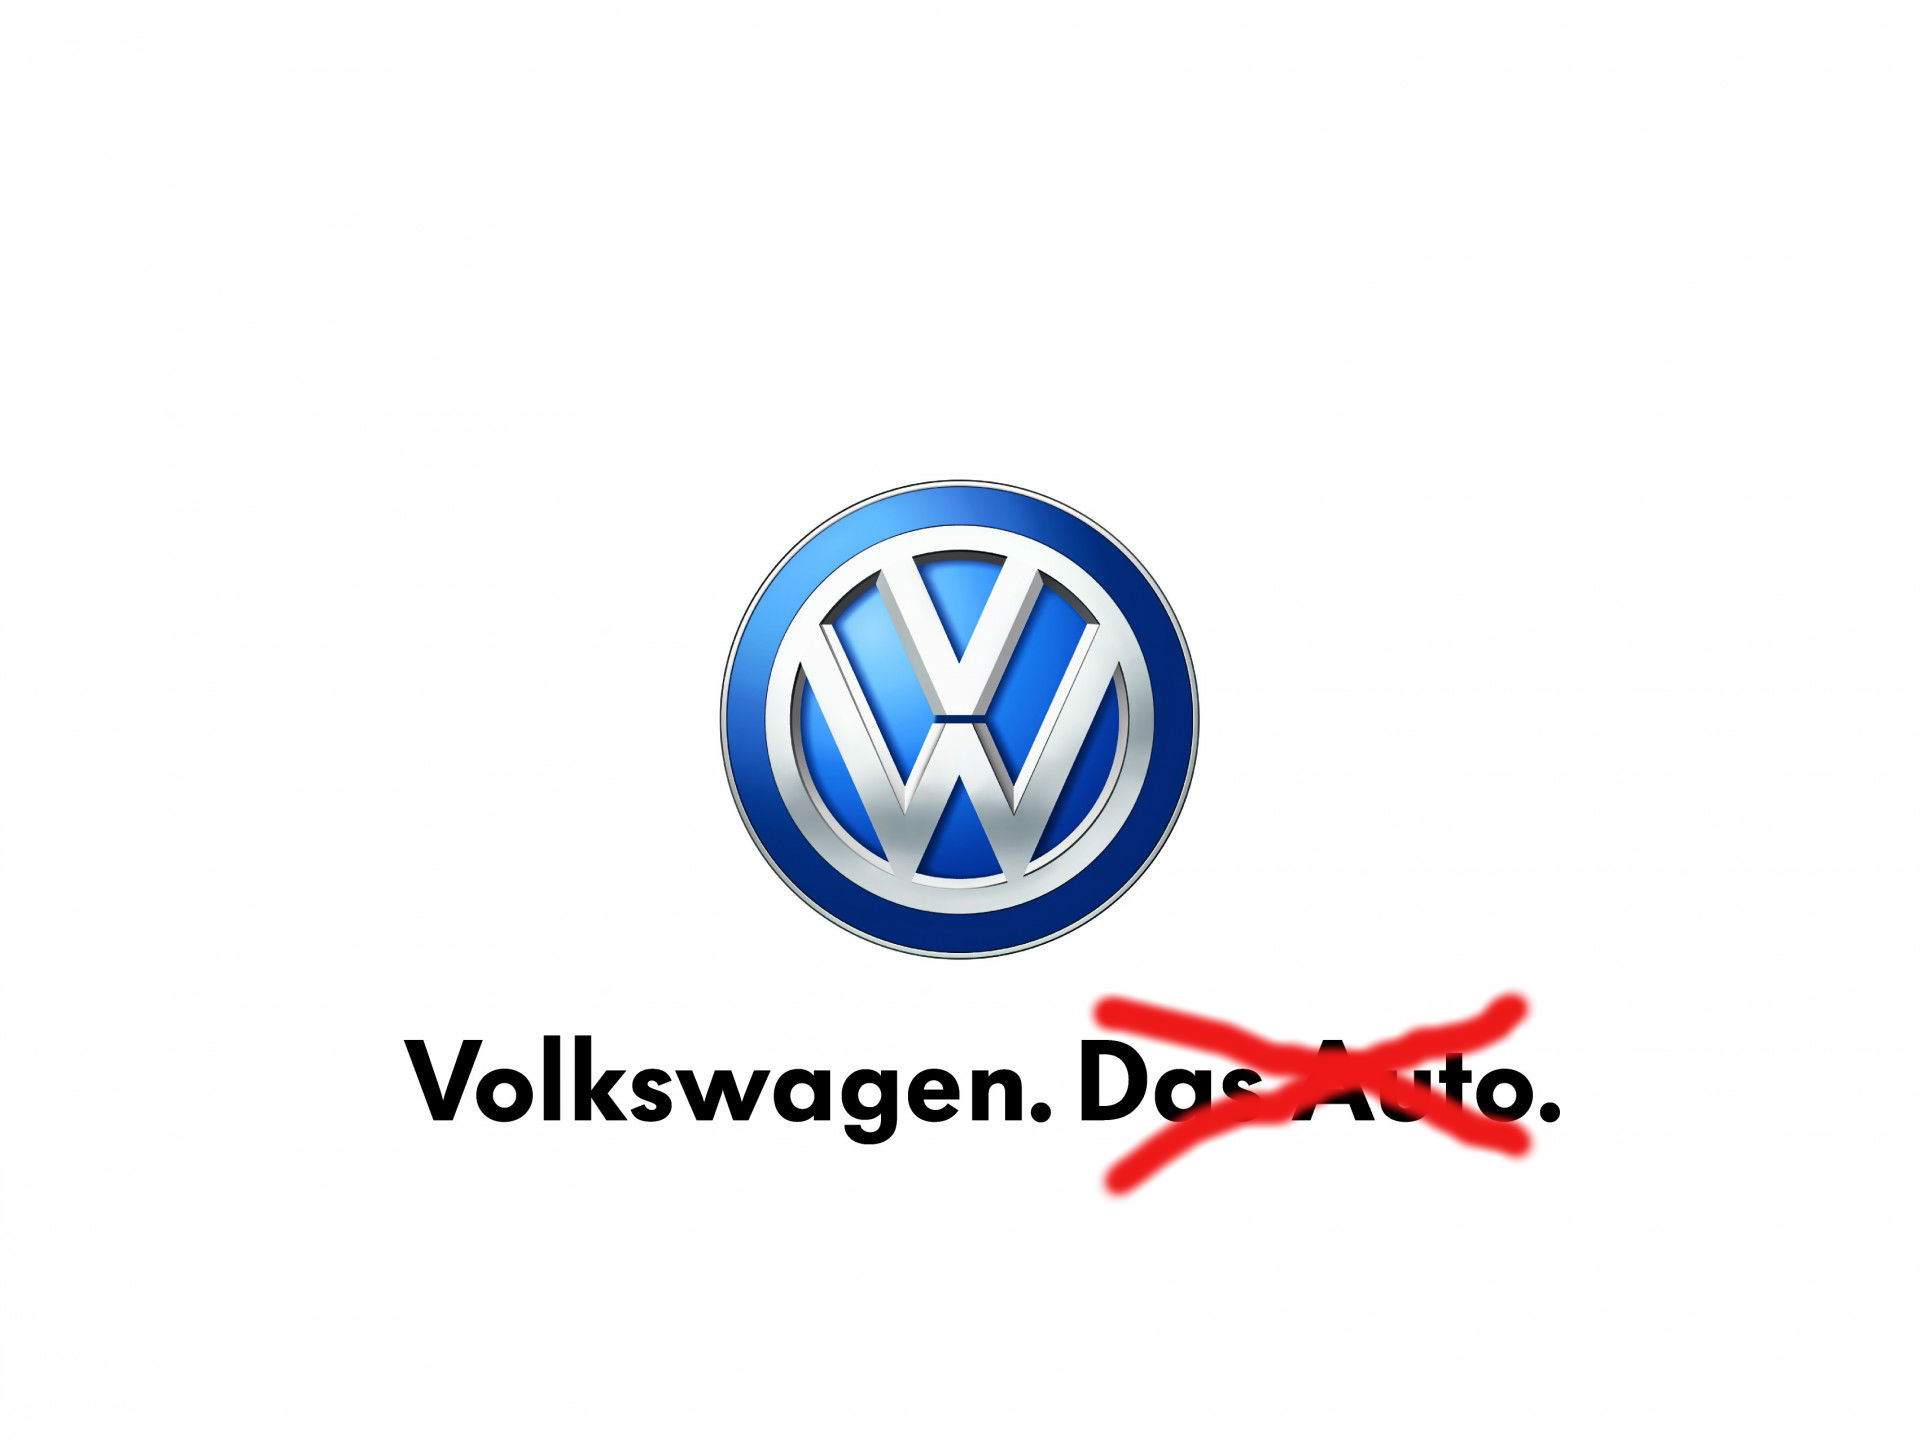 dasauto - Volkswagen drops 'Das Auto' slogan